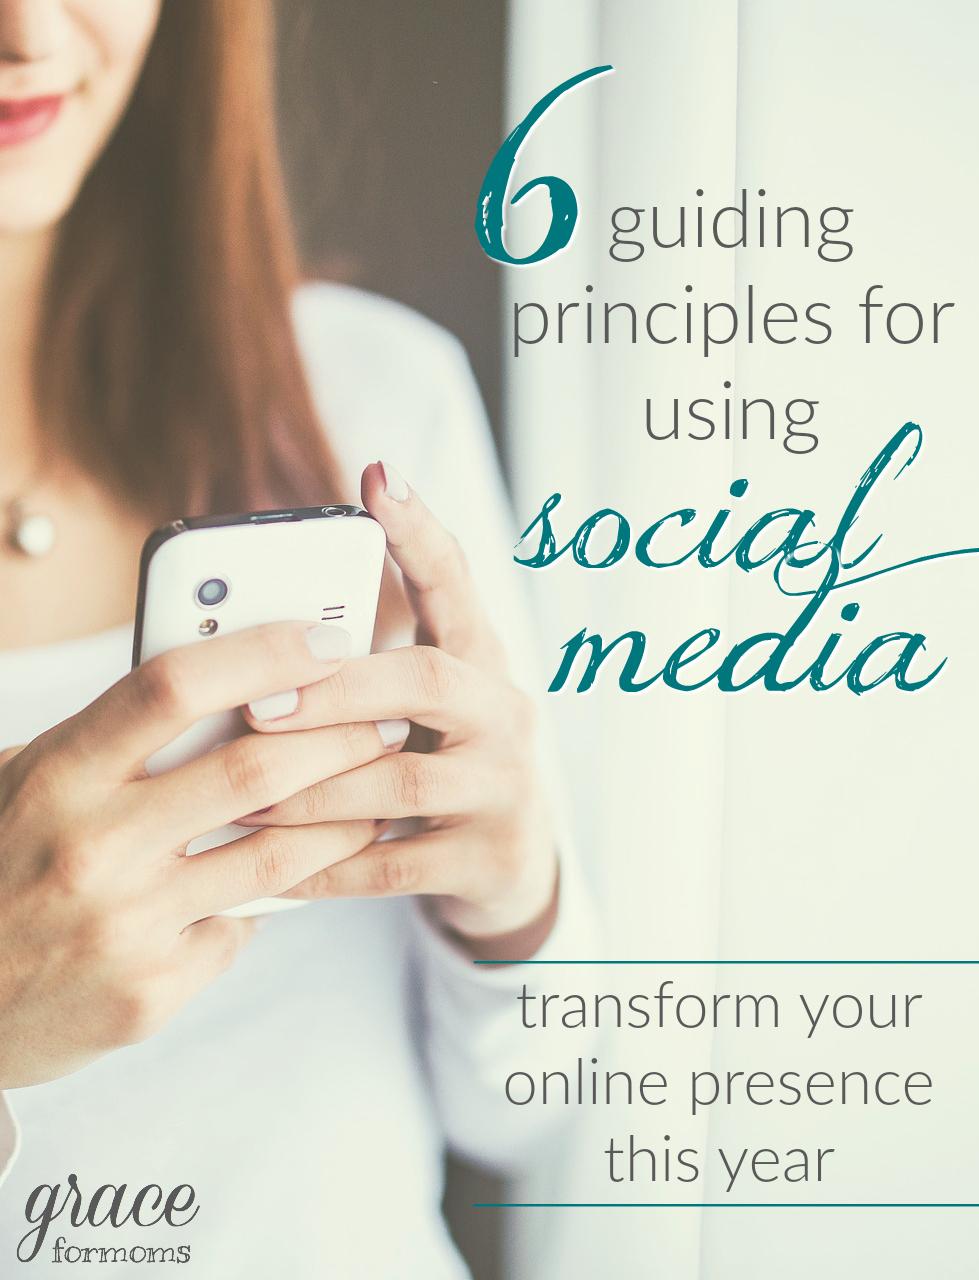 6 Guiding Principles for Using Social Media